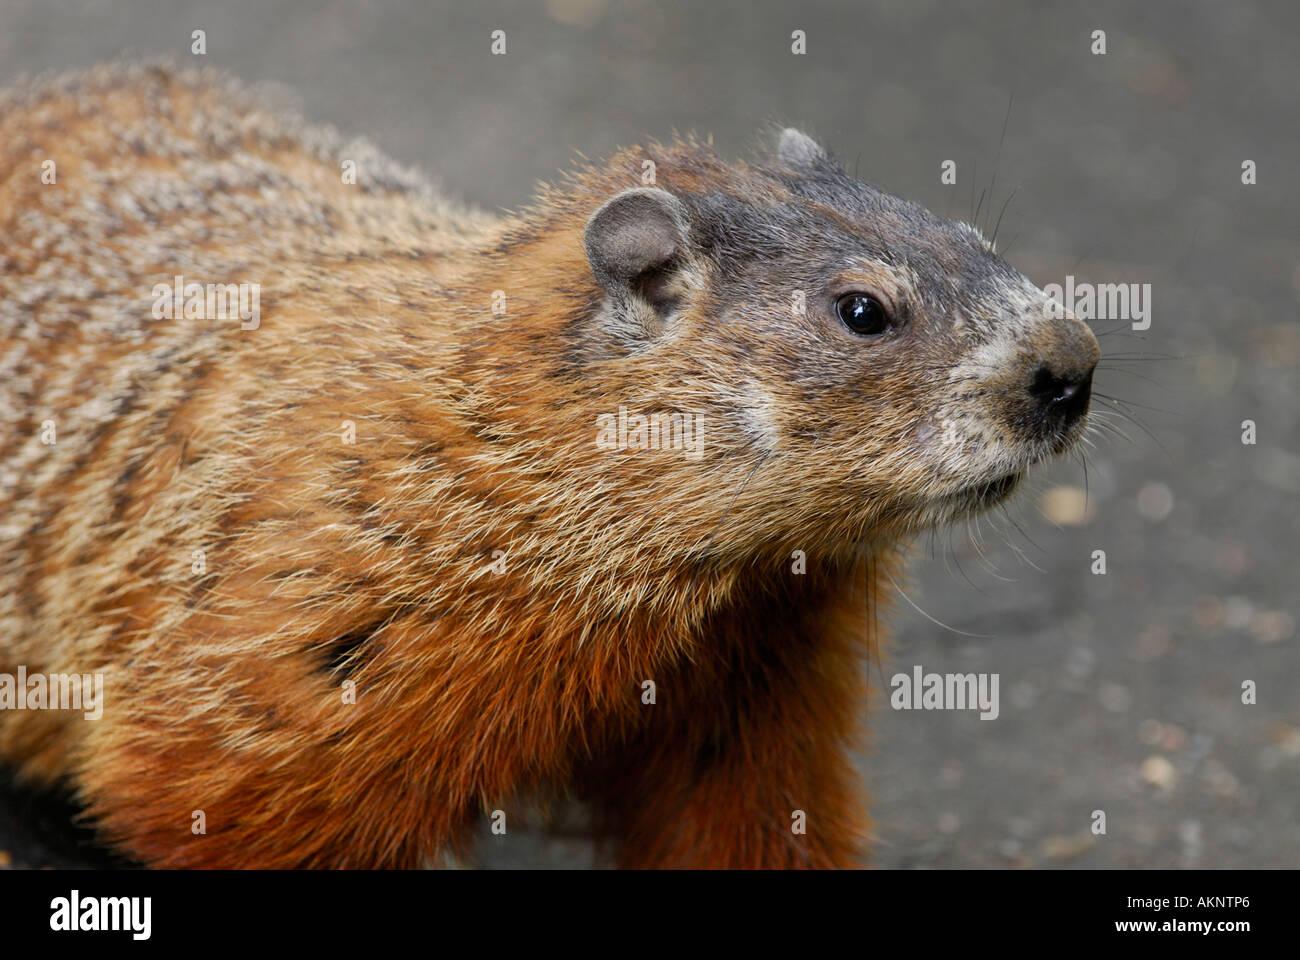 Close up of a curious Groundhog Marmota monax gopher - Stock Image